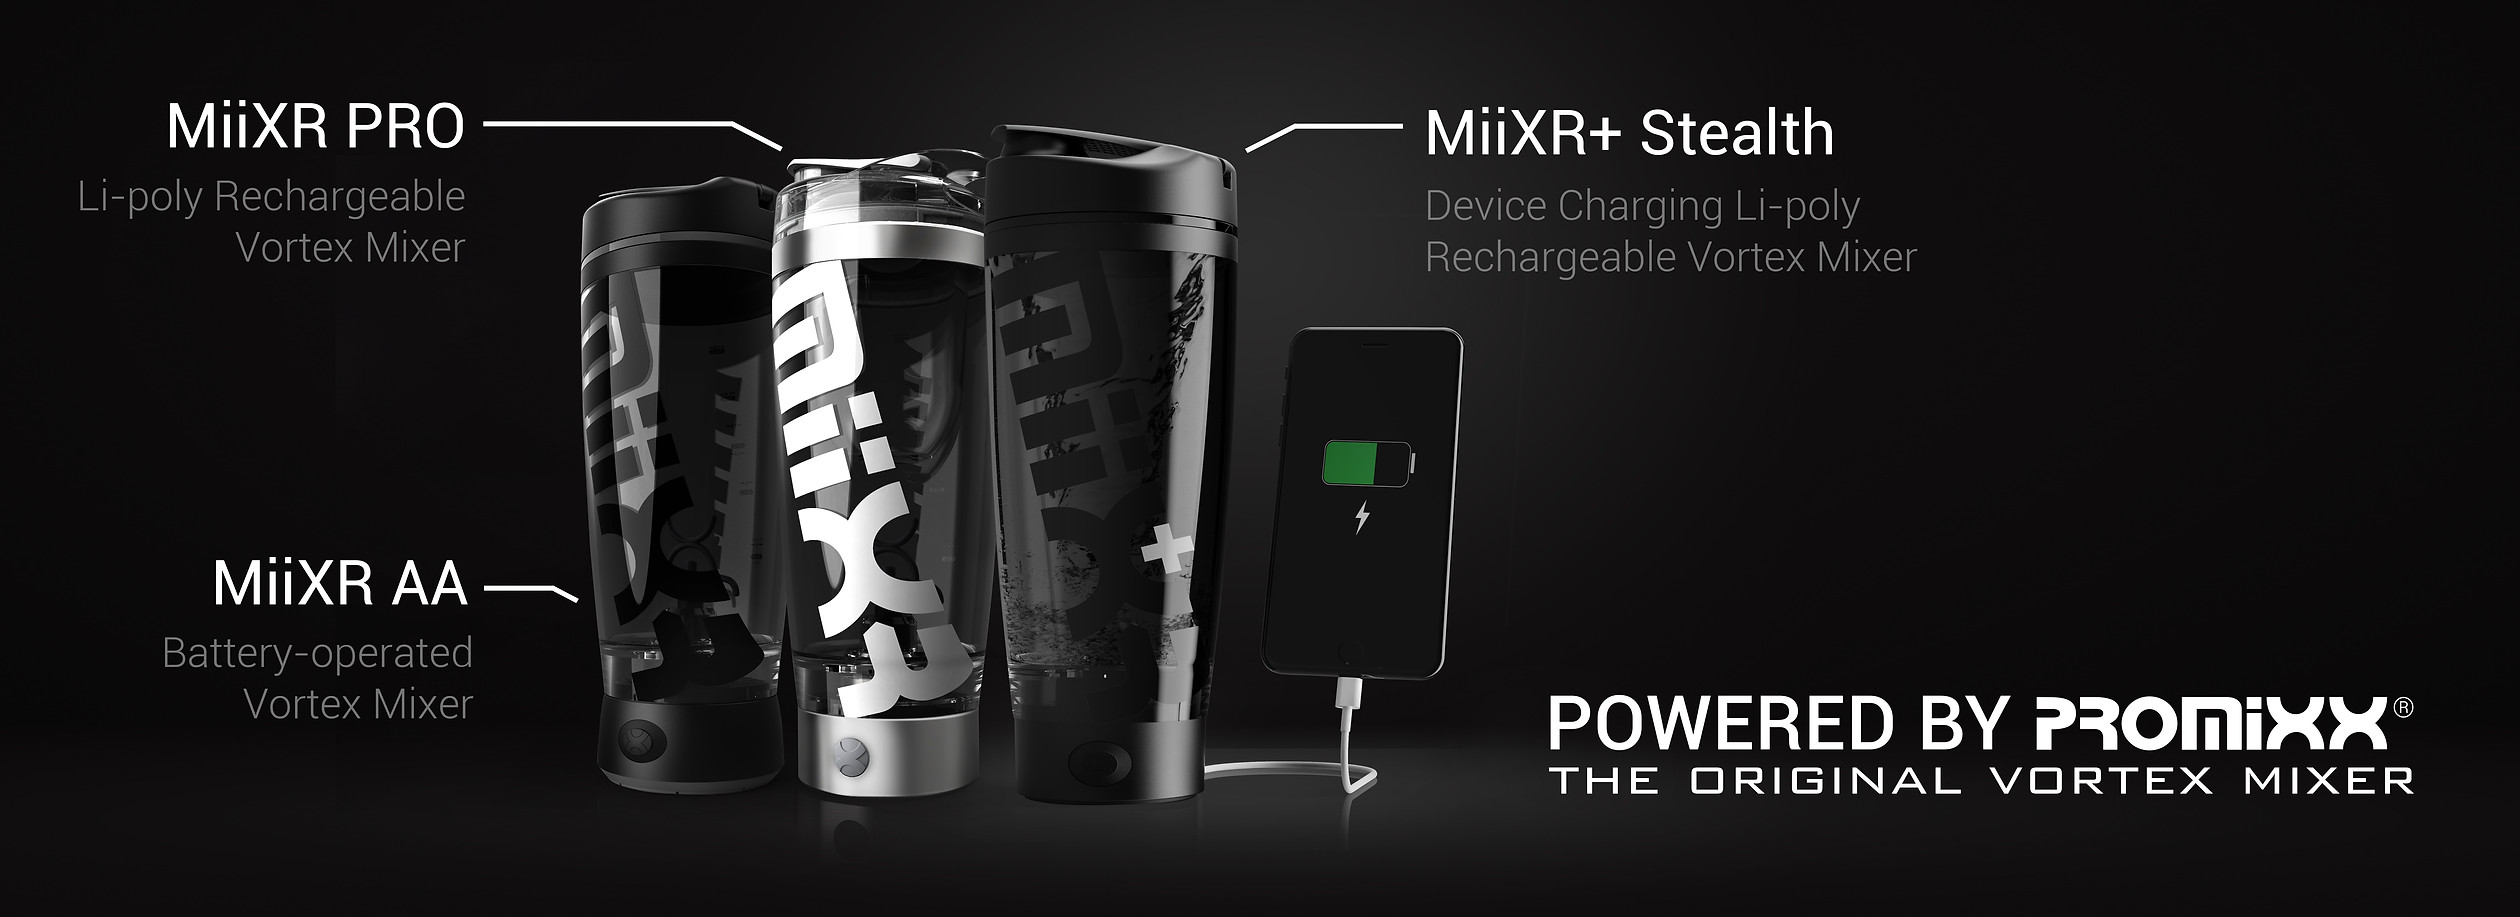 MiiXR Products_Bigger size.jpg